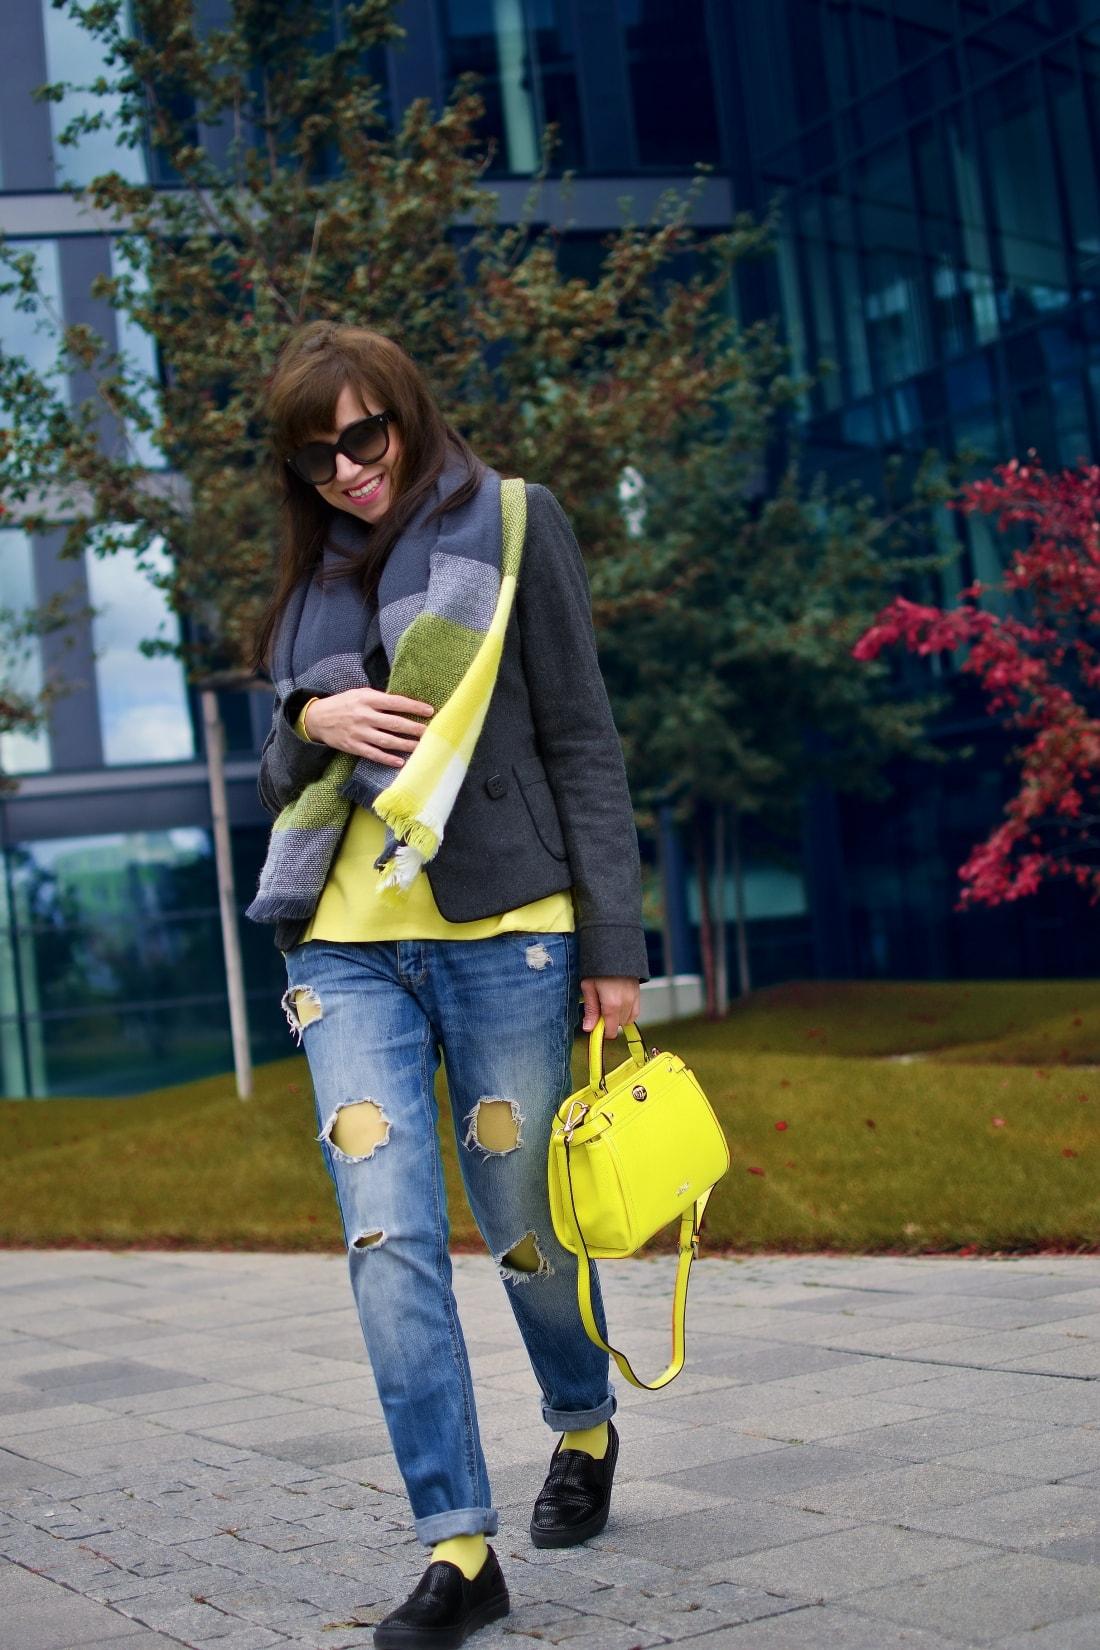 I LOVE COLOURED TIGHTS_Katharine-fashion is beautiful_blog 4_autumn look_Ripped jeans_Žltý sveter Zara_Žltá kabelka Nucelle_Čierne slipony Eobuv_Katarína Jakubčová_Fashion blogger